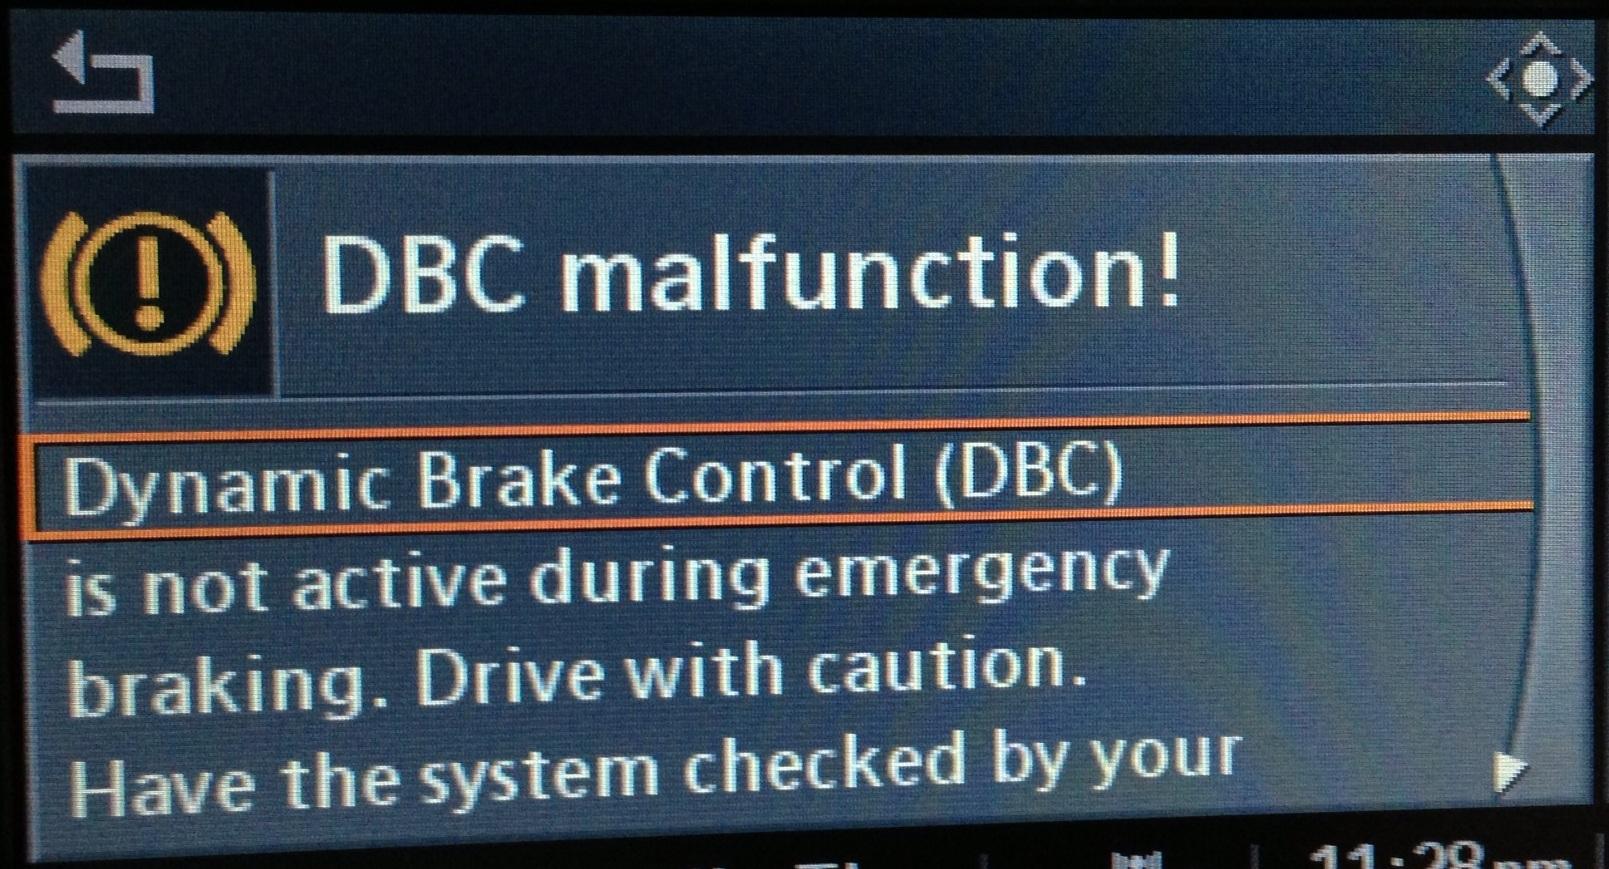 HELP, 2008 BMW M6 DSC malfunc, EDC Error-photo-5.jpg